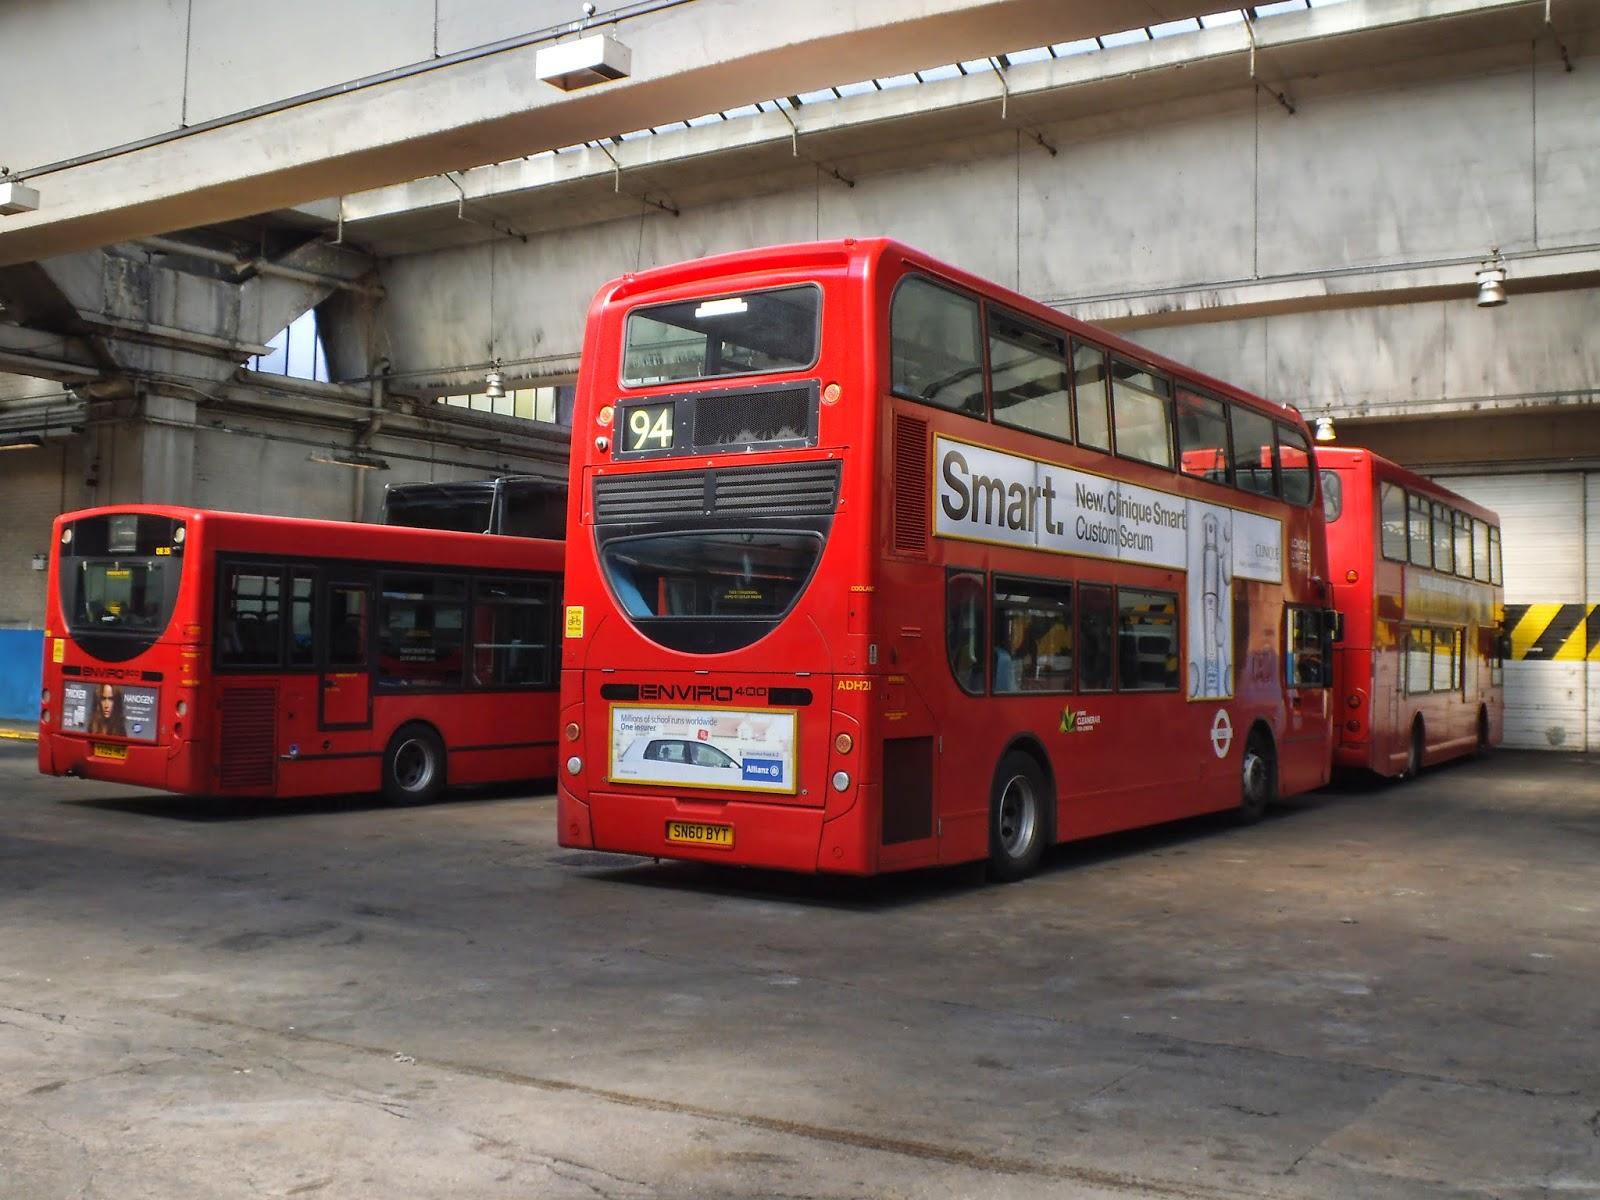 The circle of london london united shepherd 39 s bush for Bus timetable perth 85